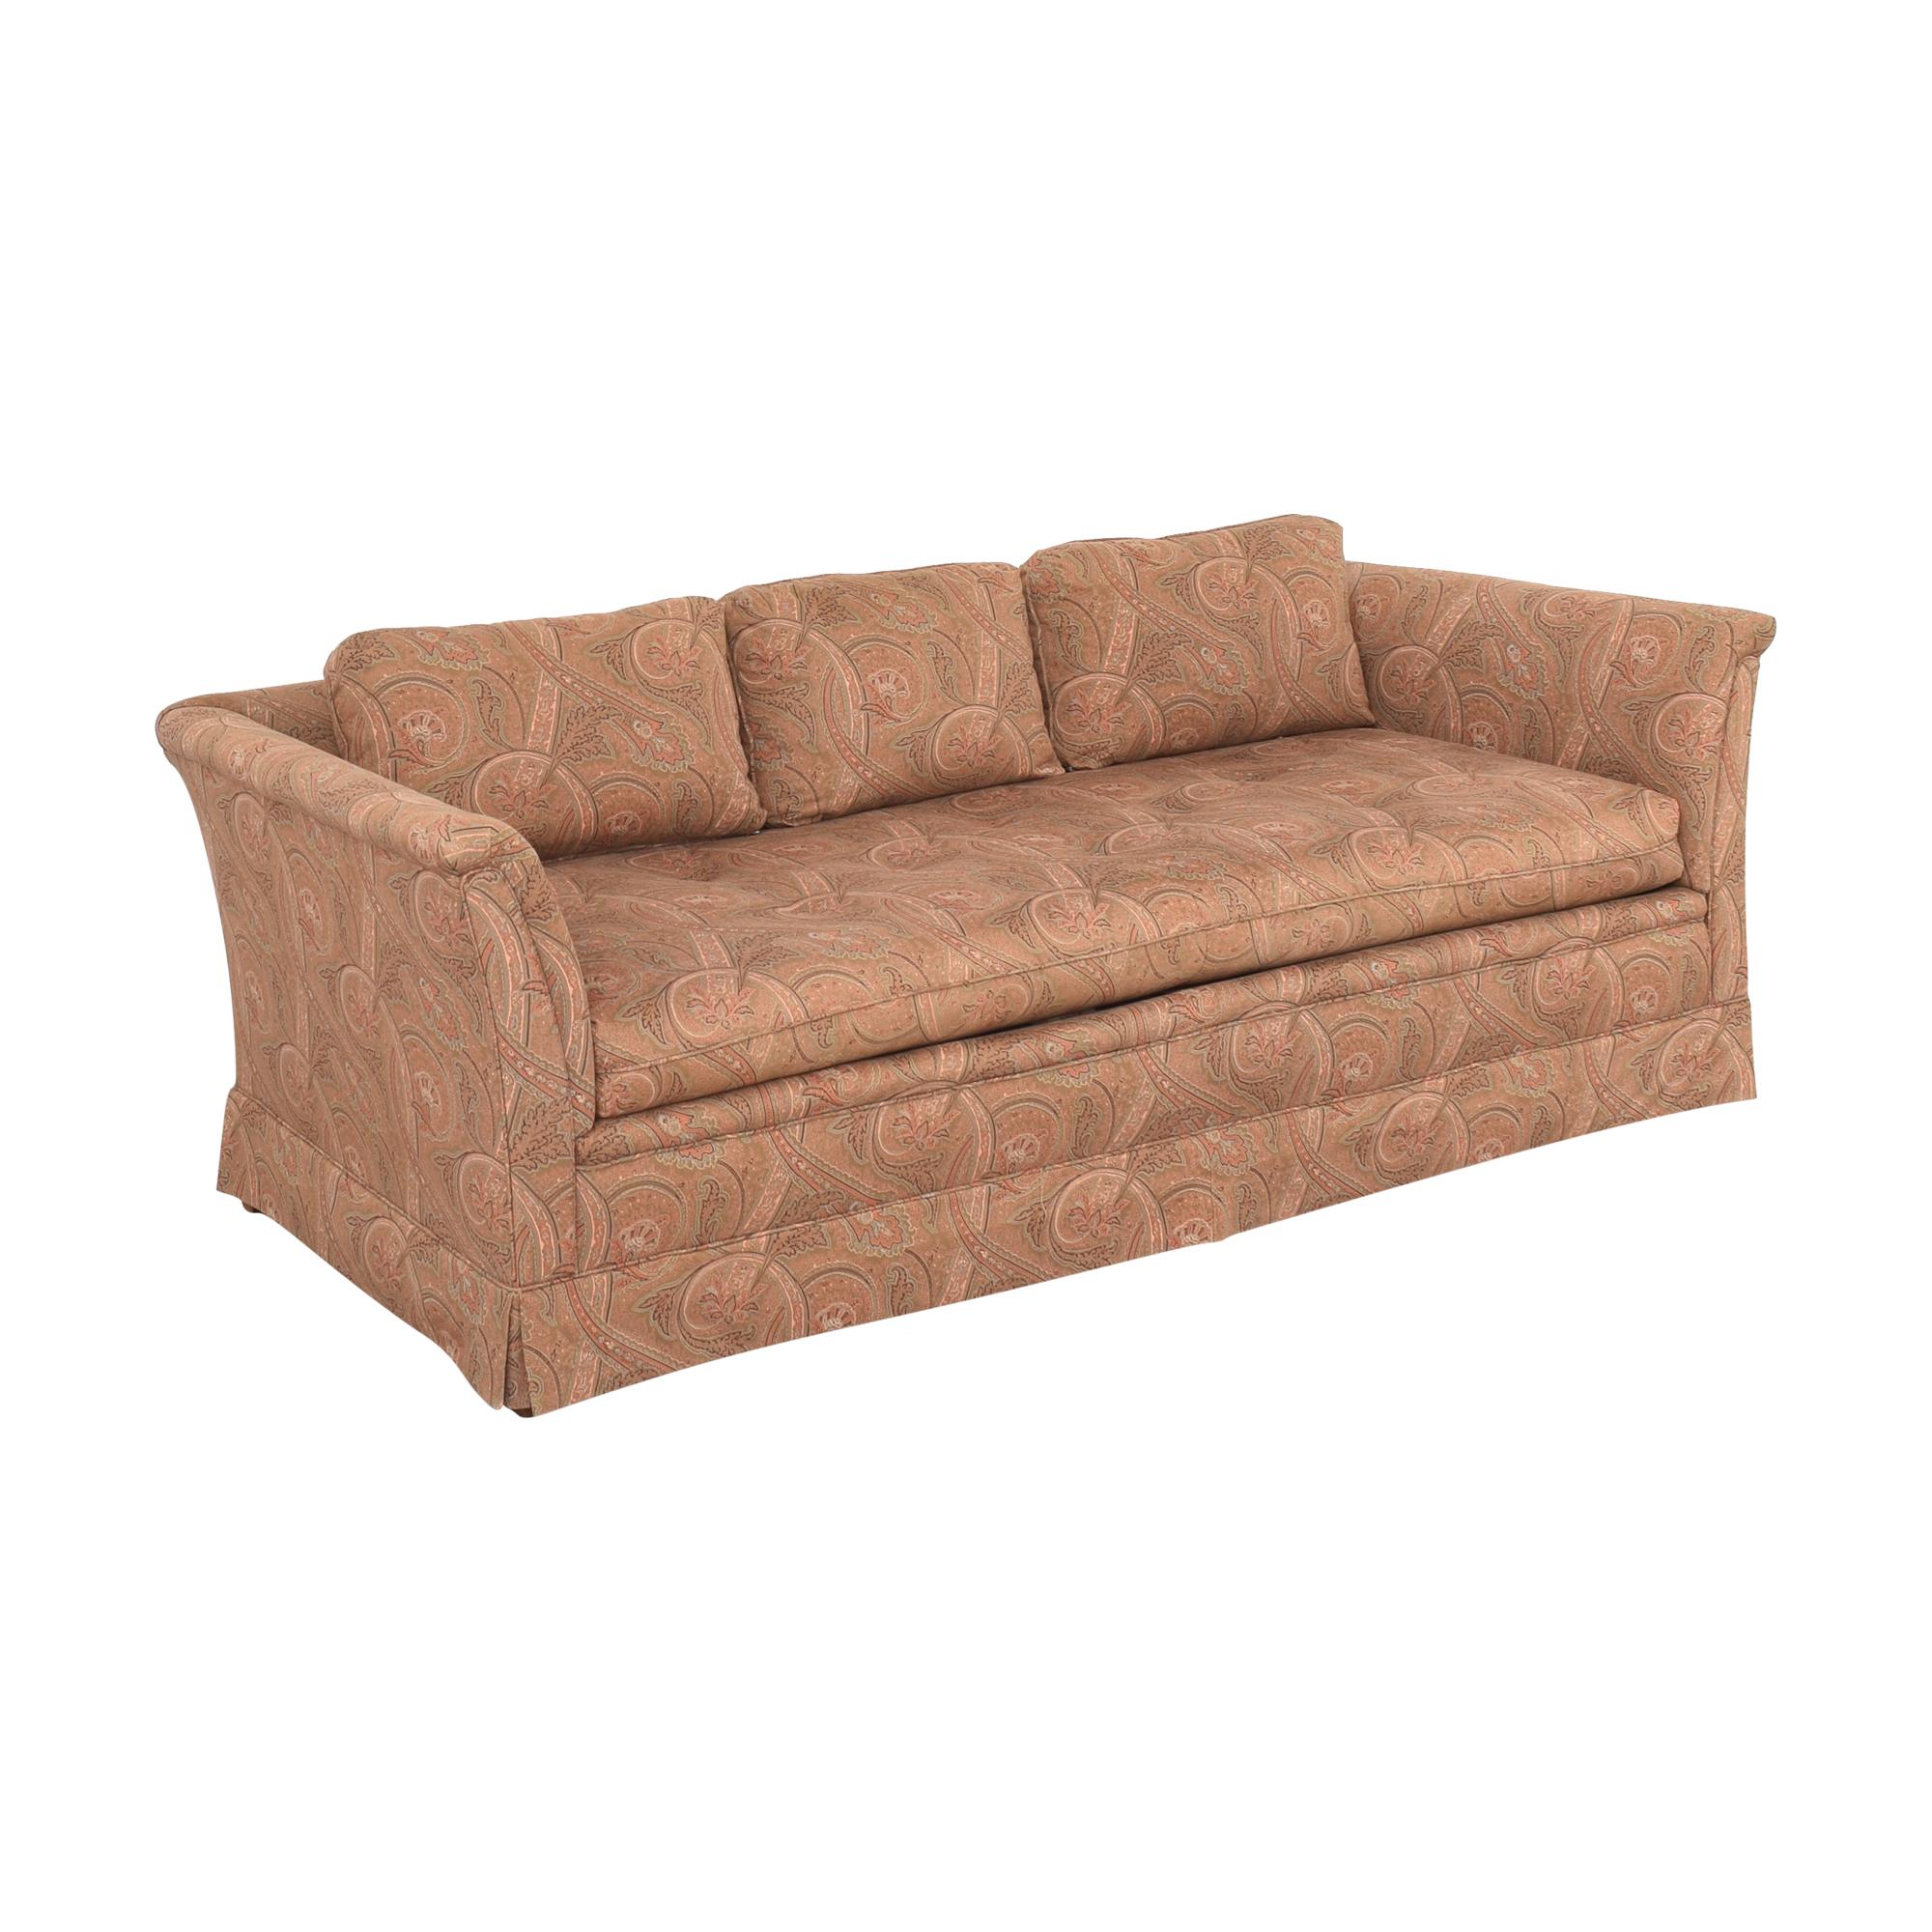 Bloomingdale's Paisley Bench Cushion Sofa sale